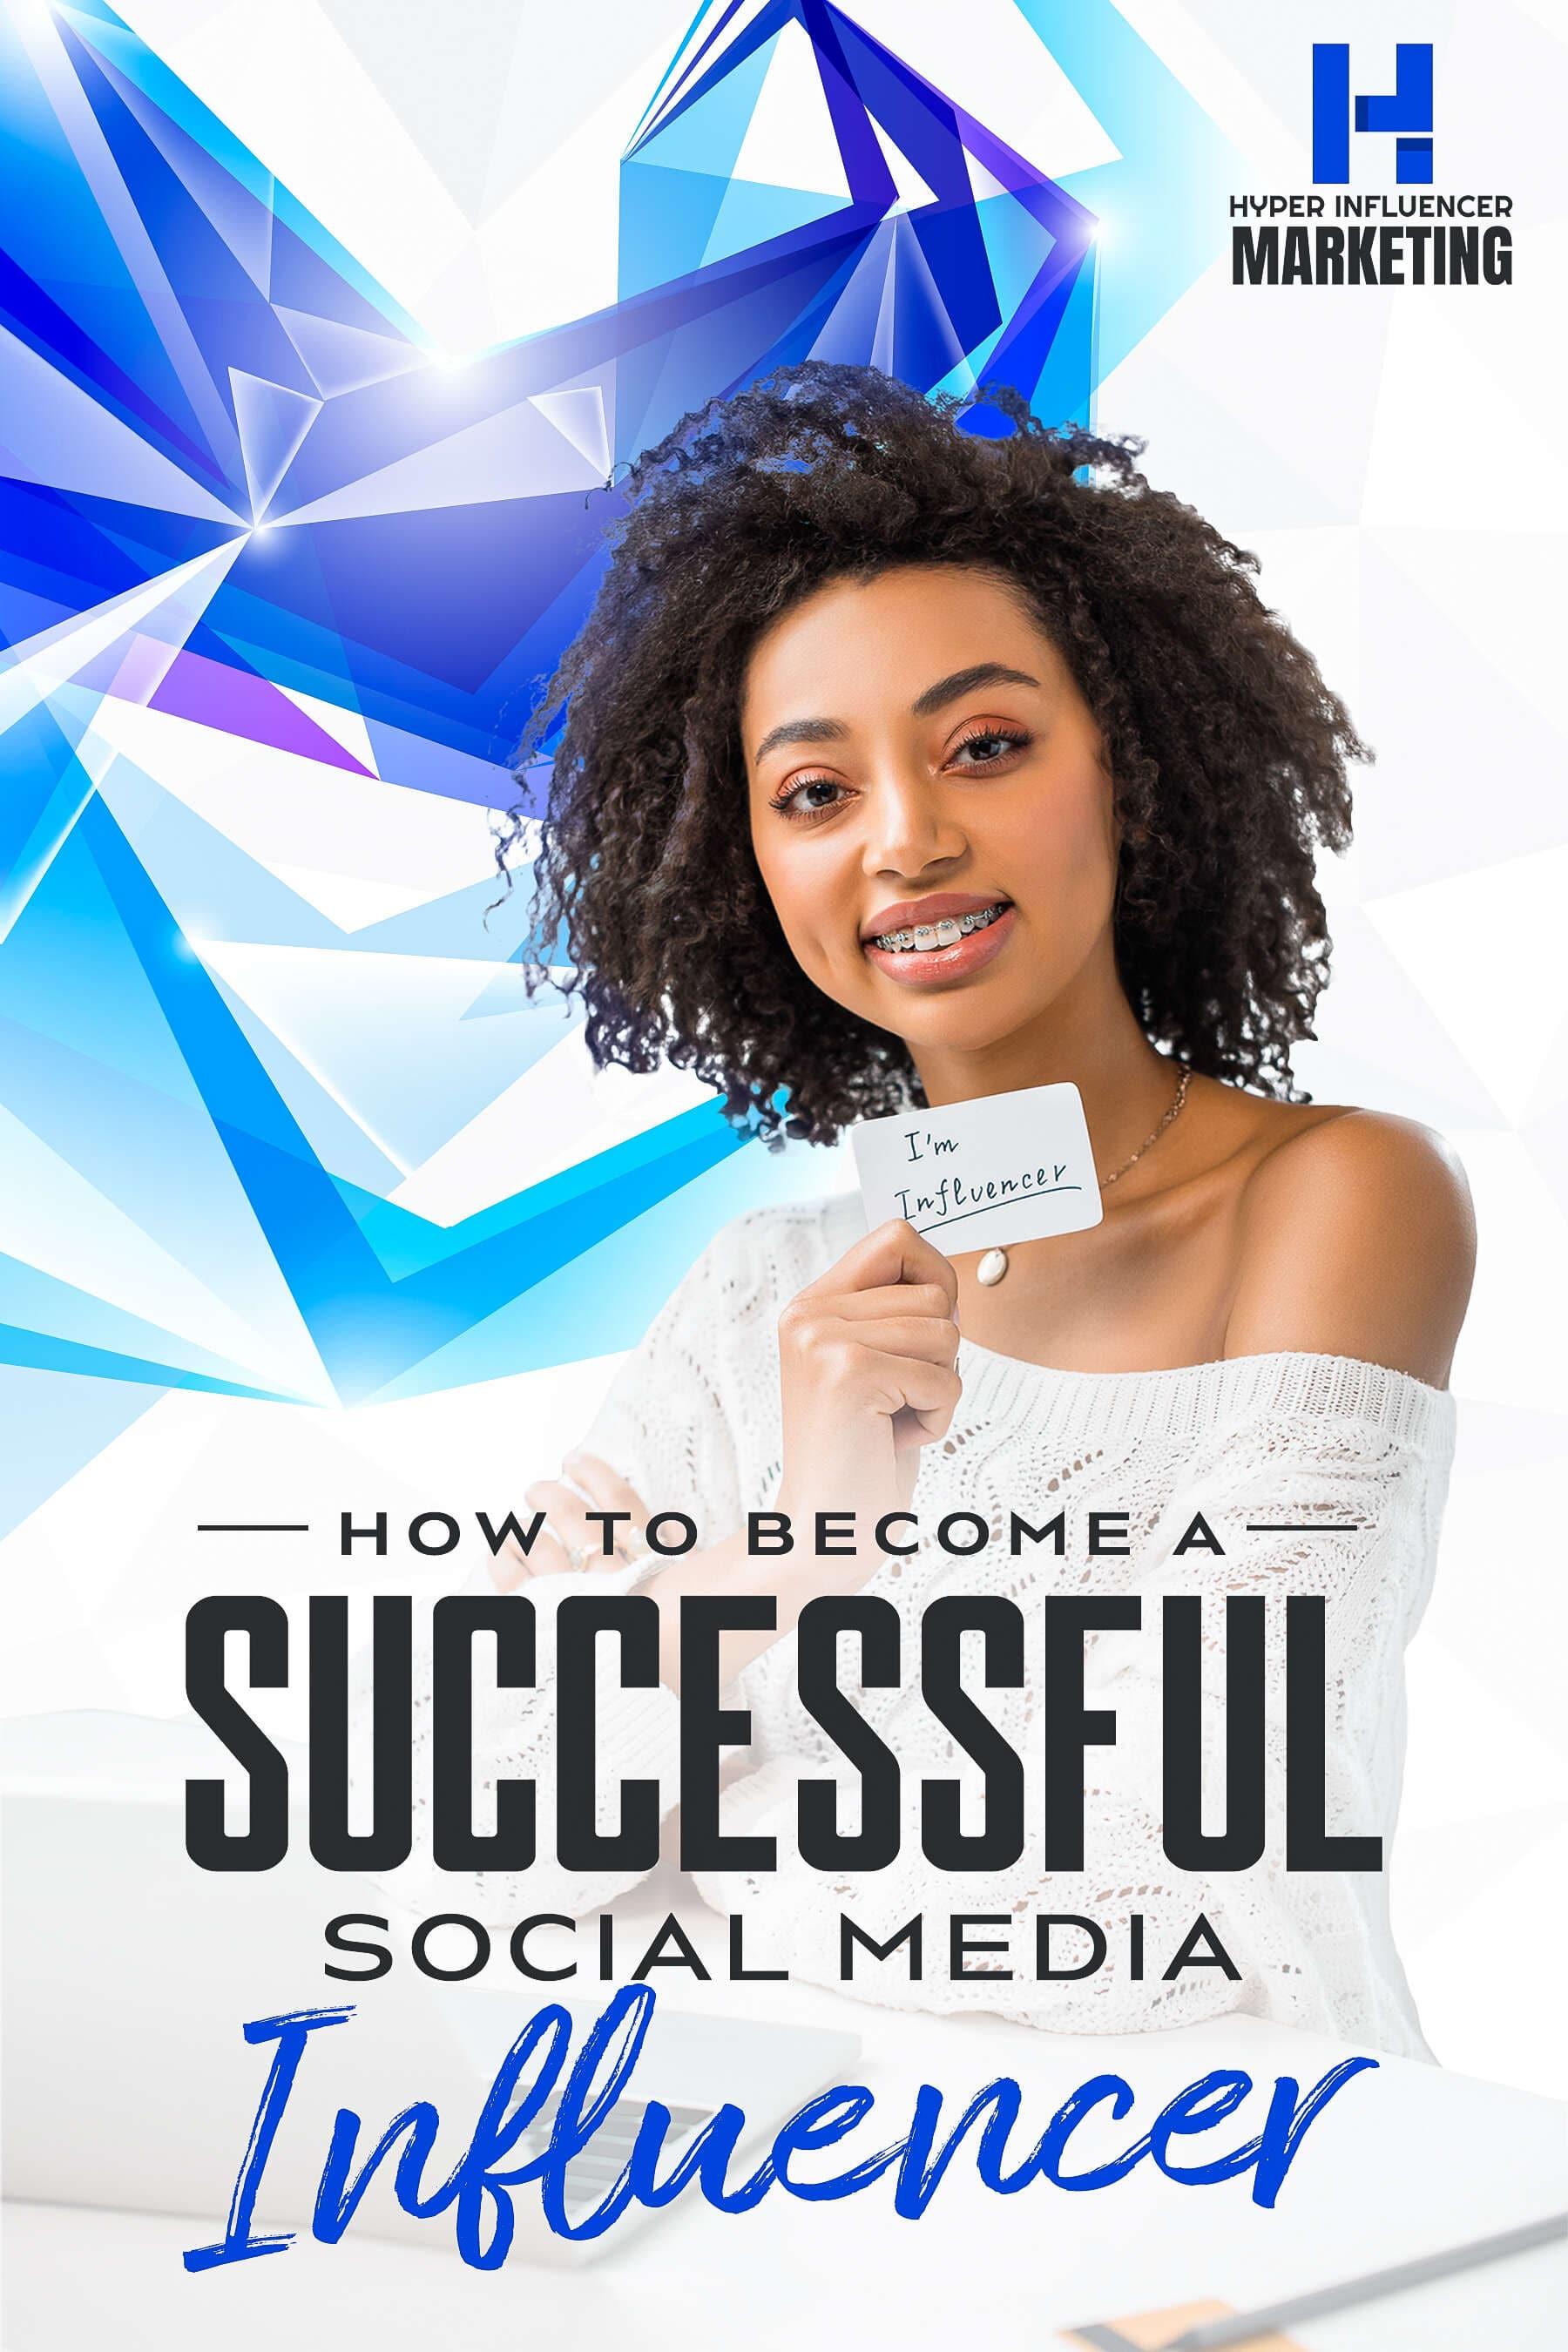 Hyper Influencer Marketing (How To Become A Successful Social Media Influencer) Ebook's Ebook Image